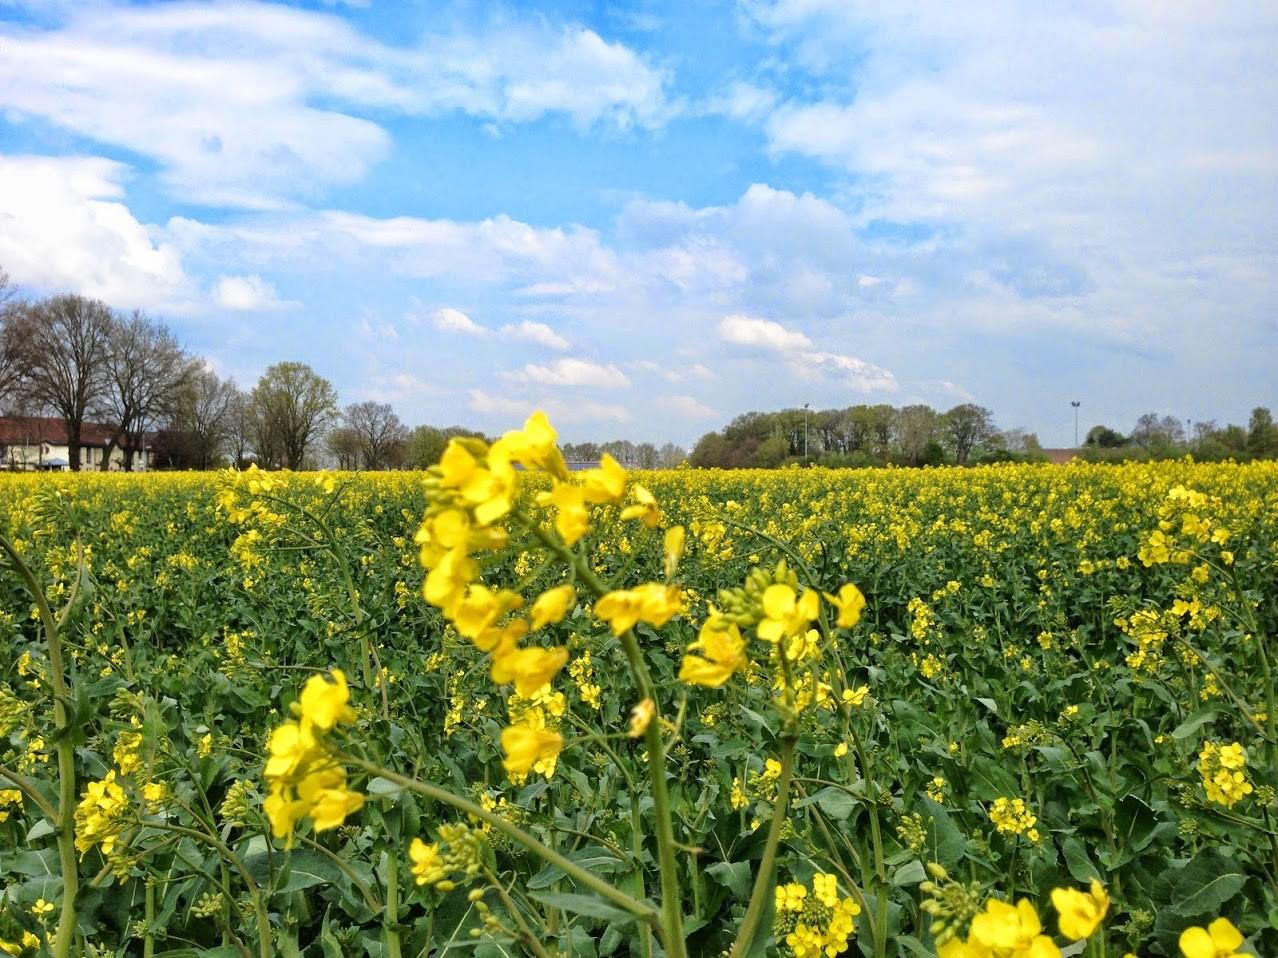 ~ Bild: Frühlingsfeld ~